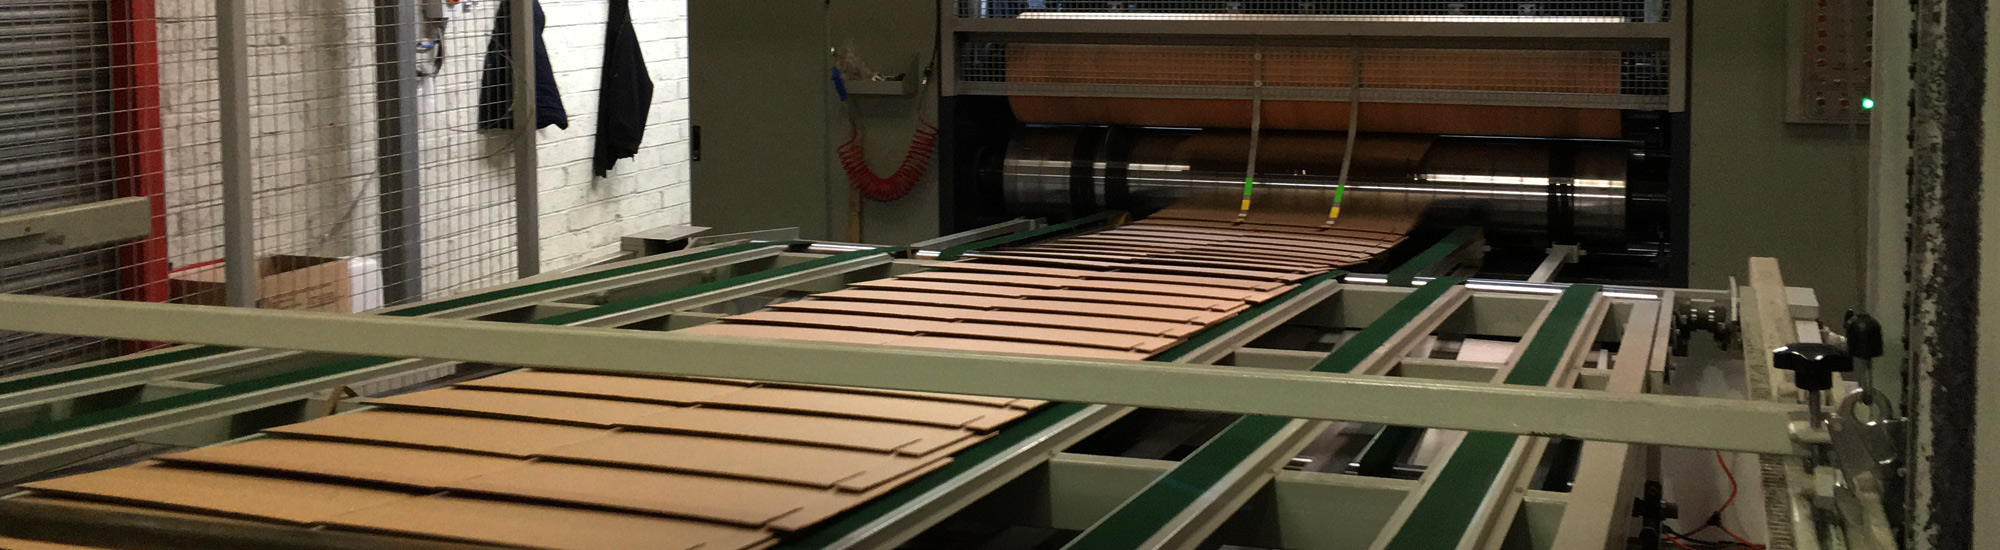 Innovative corrugated packaged design